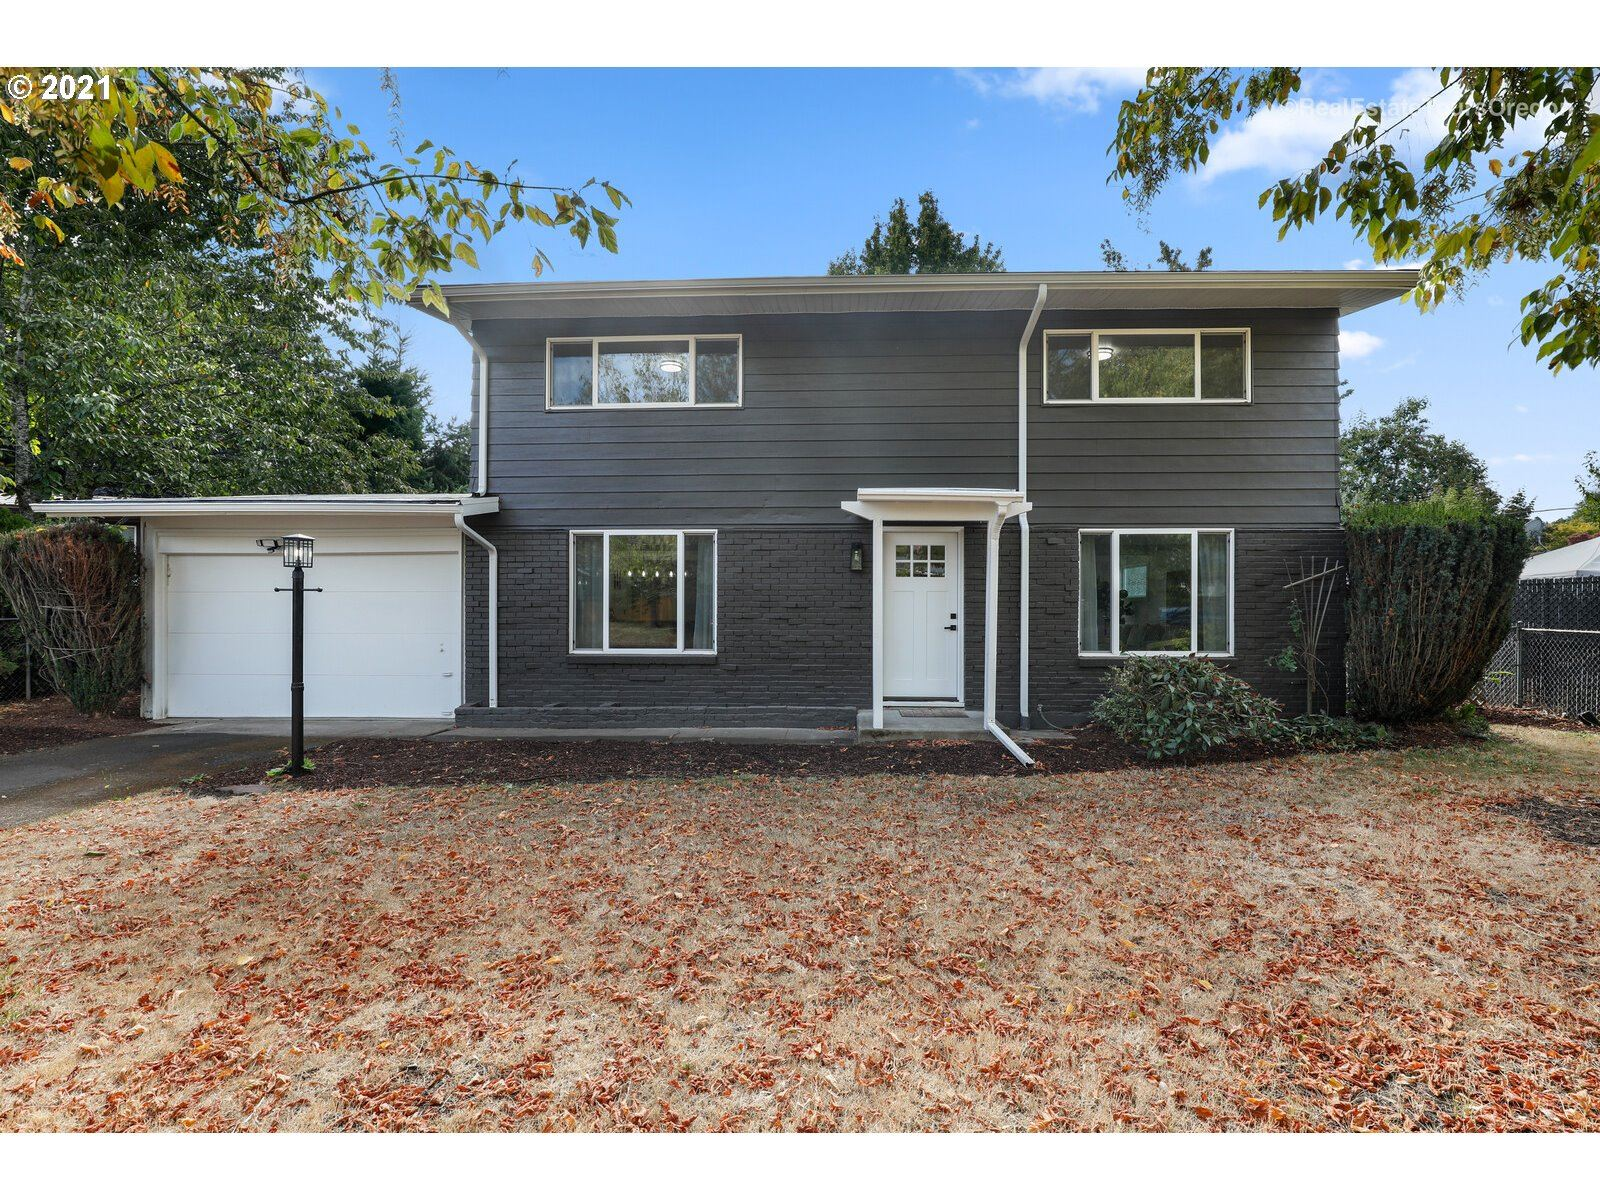 16520 SE TIBBETTS ST, Portland, OR 97236 - MLS#: 21585535